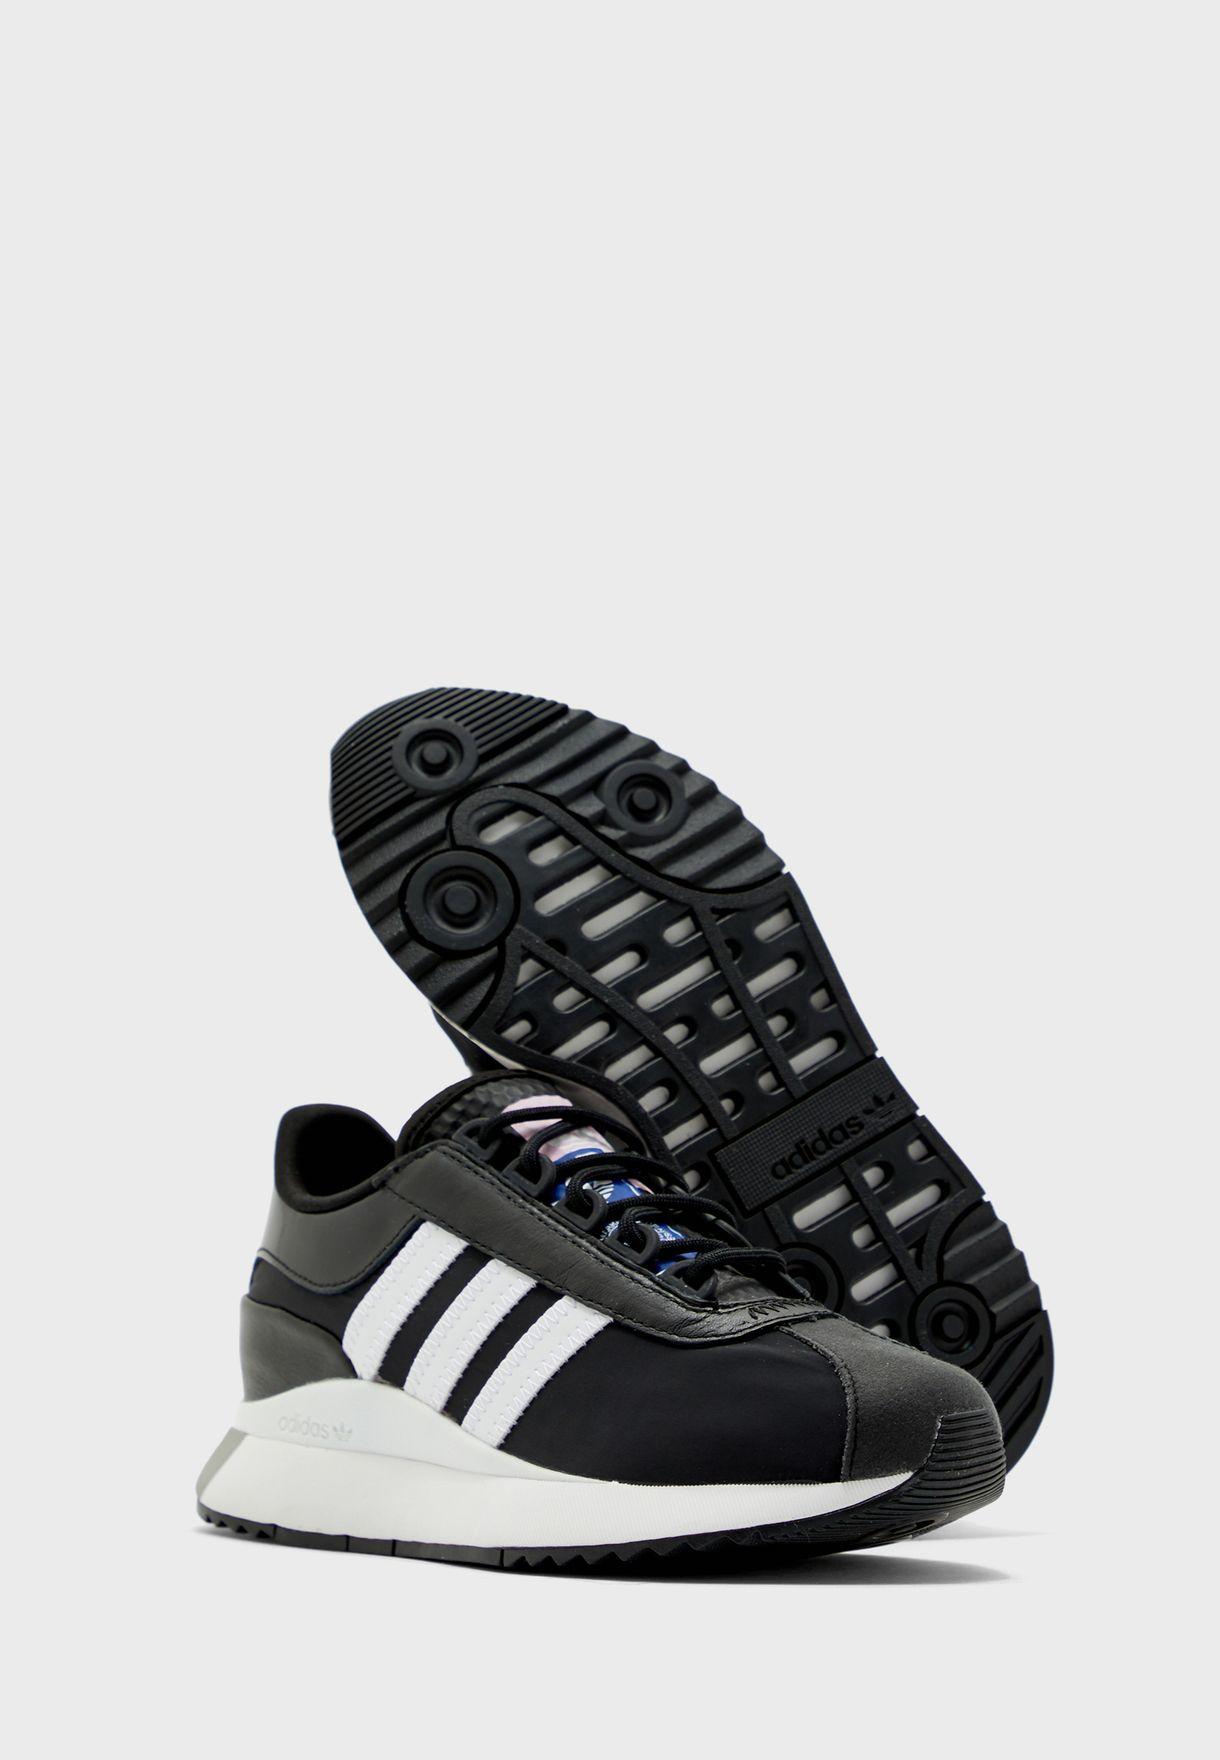 SL Andridge Casual Women's Sneakers Shoes